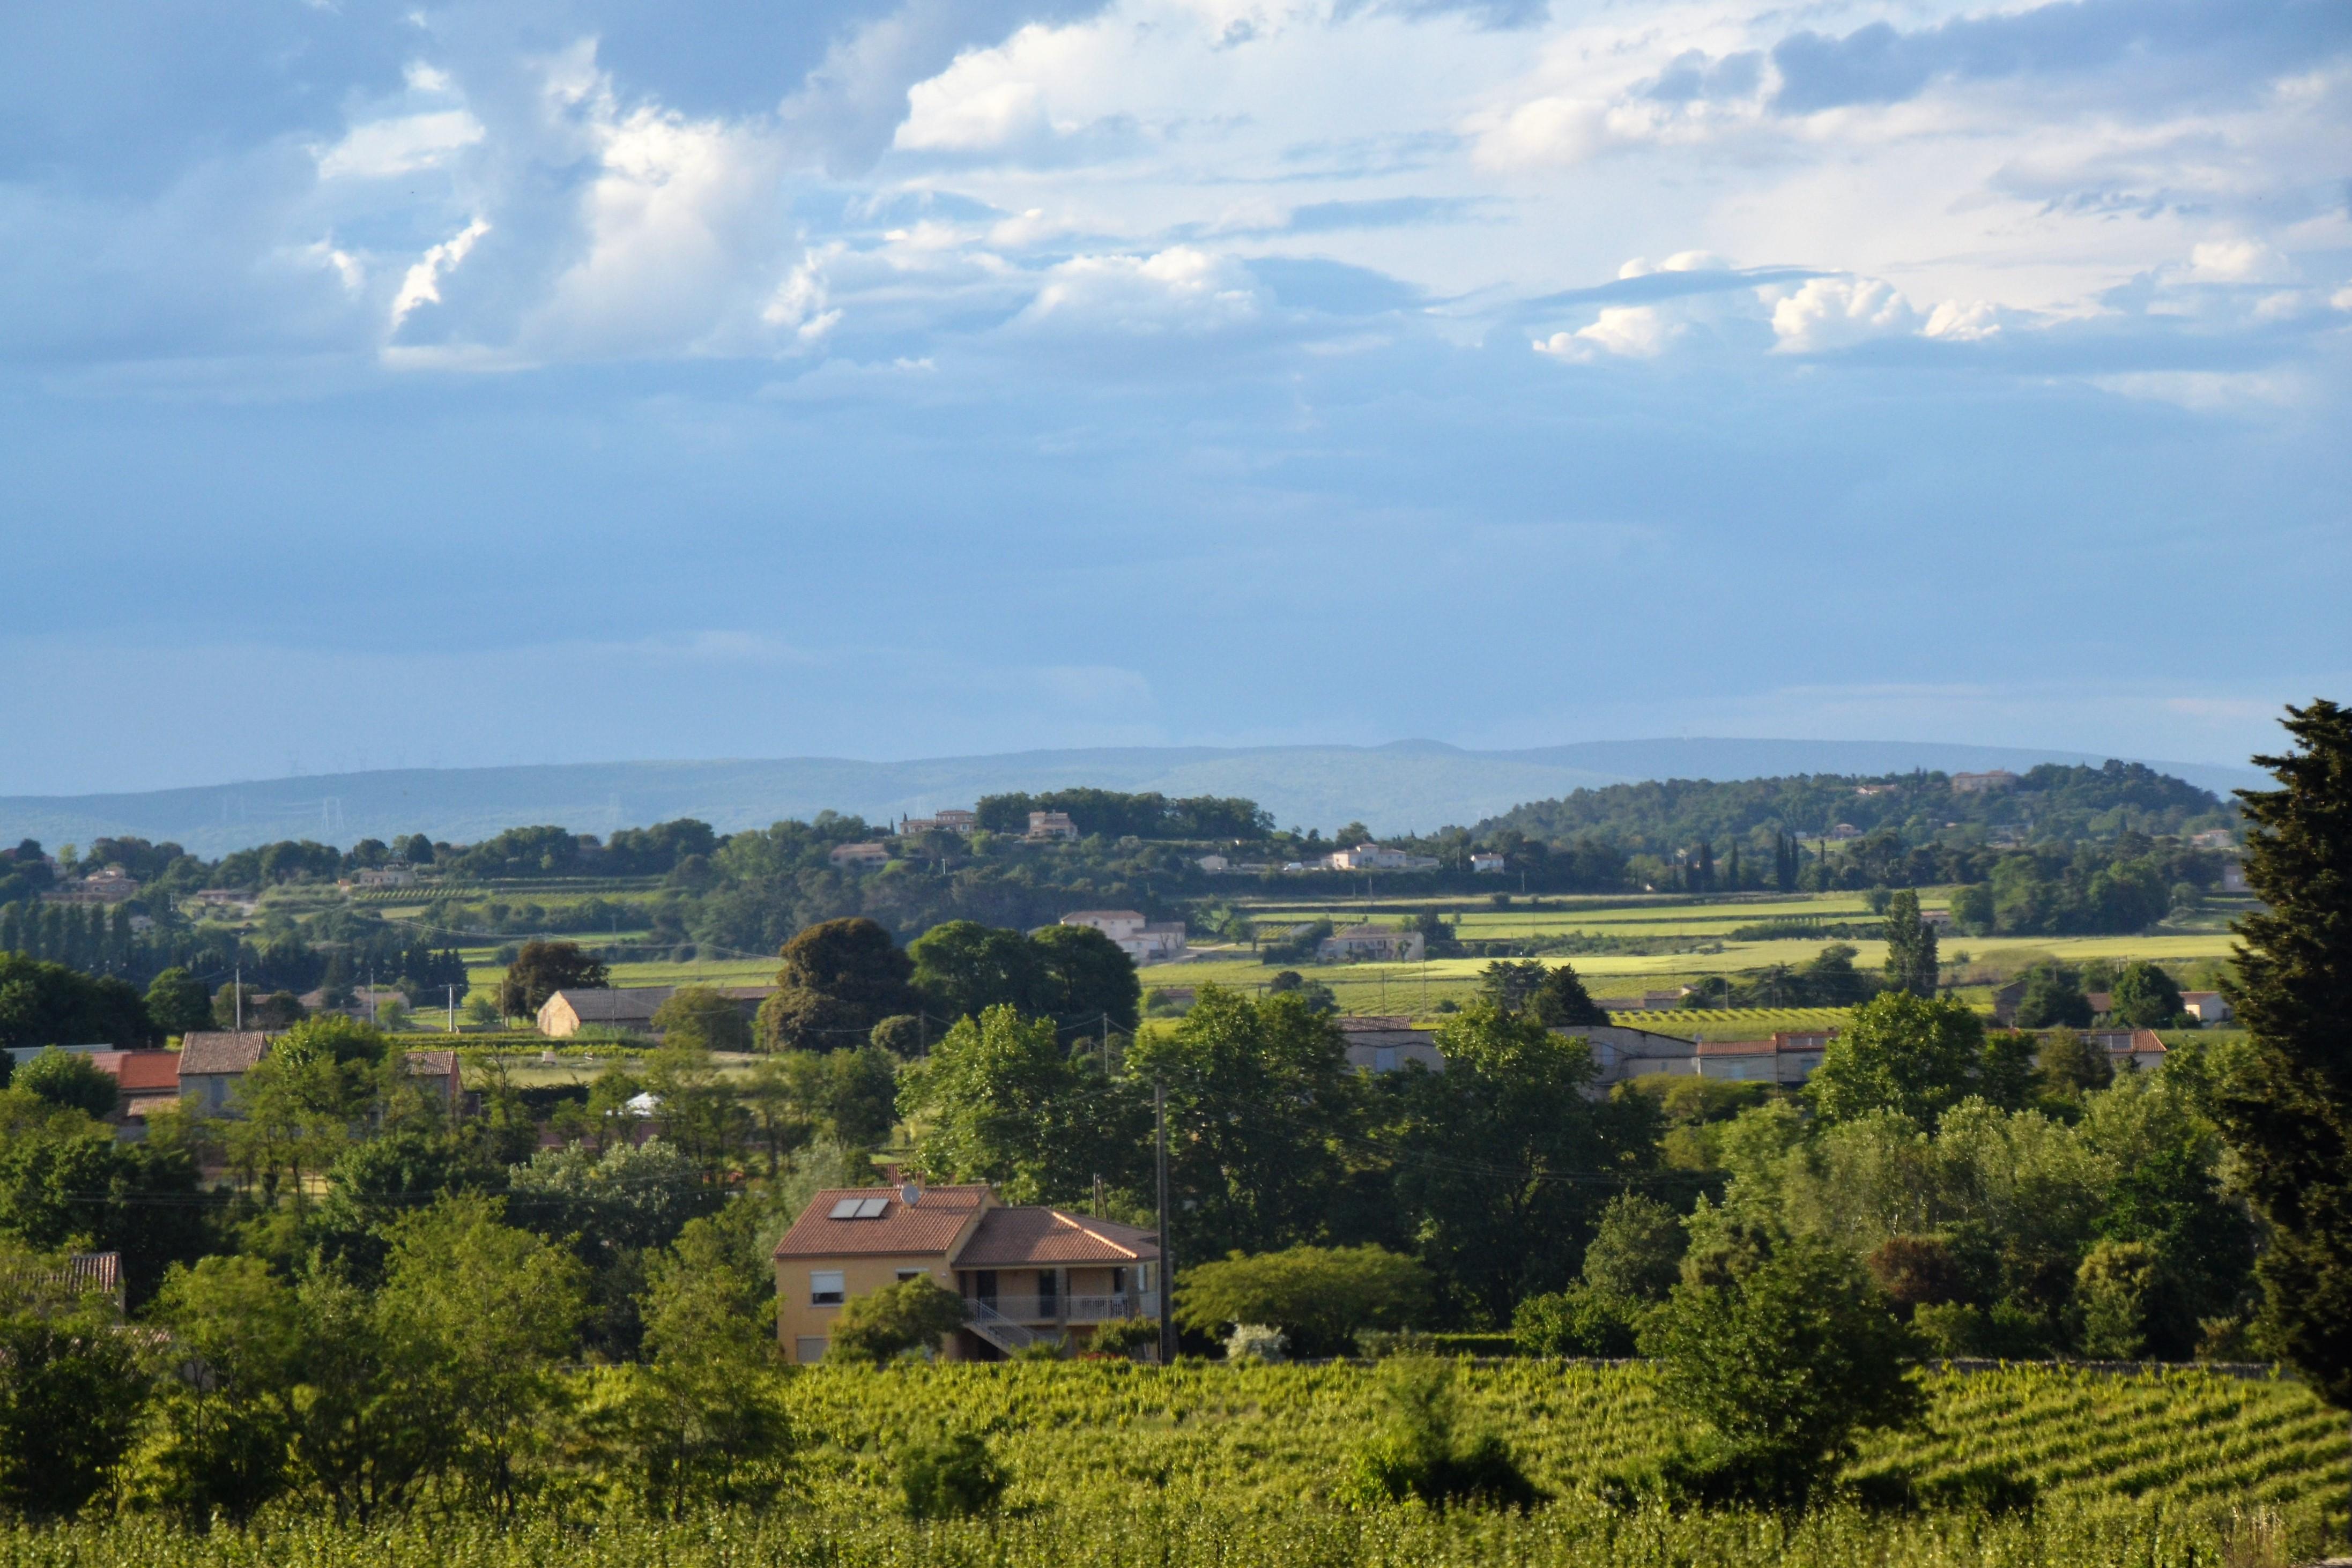 Wine stay in the Rhone valley - Rhone Valley - Rhone Valley - 3